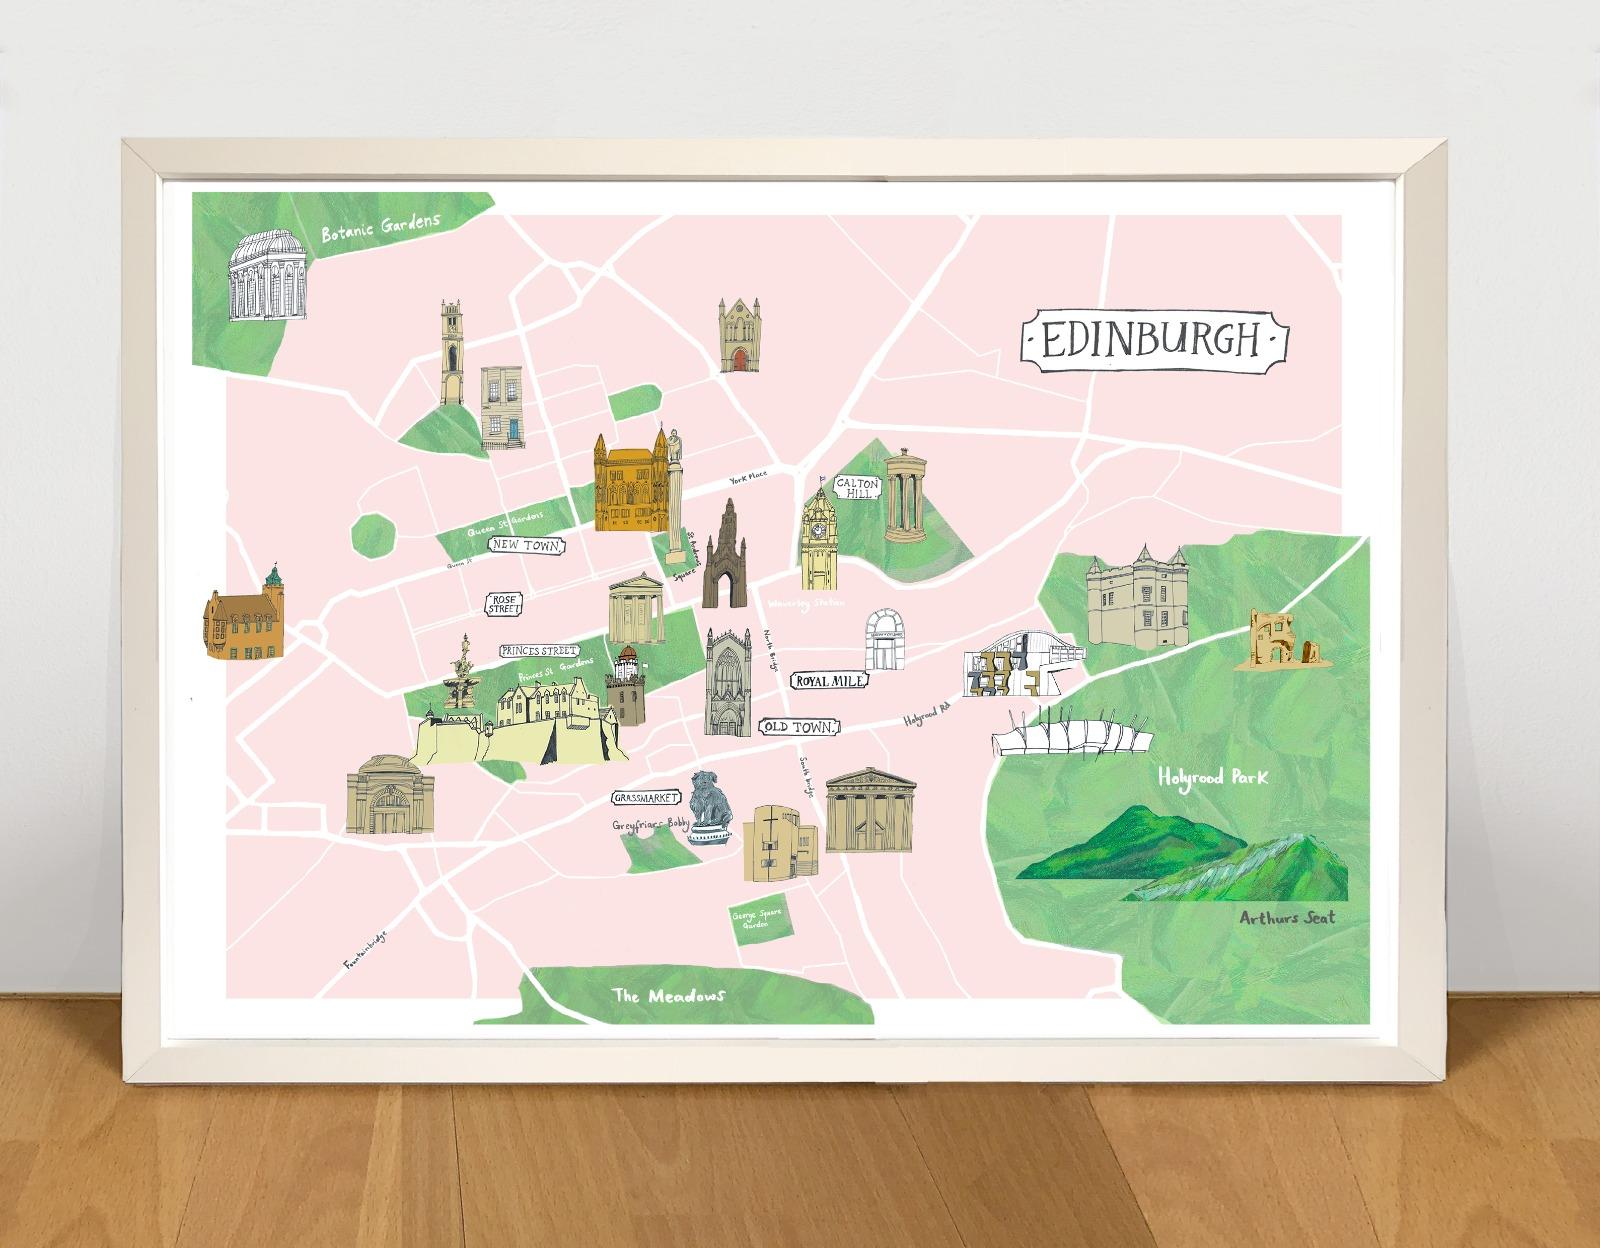 Kaitlin Mechan A3 Edinburgh Map Print